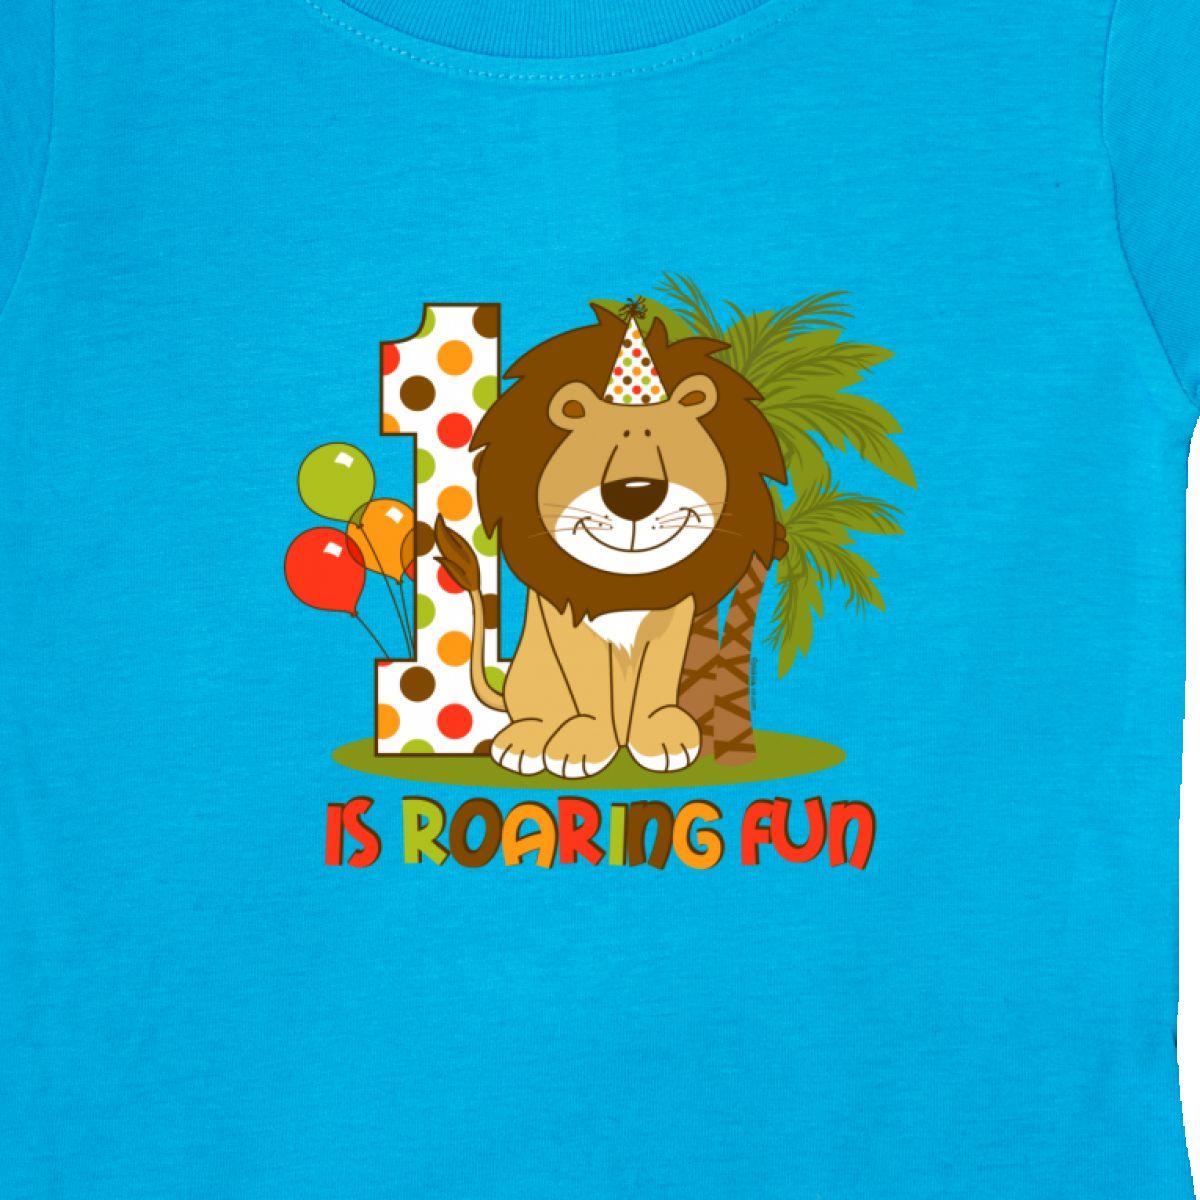 Inktastic-Cute-Lion-1st-Birthday-Baby-T-Shirt-Roaring-Fun-Pinkinkartkids-First thumbnail 20